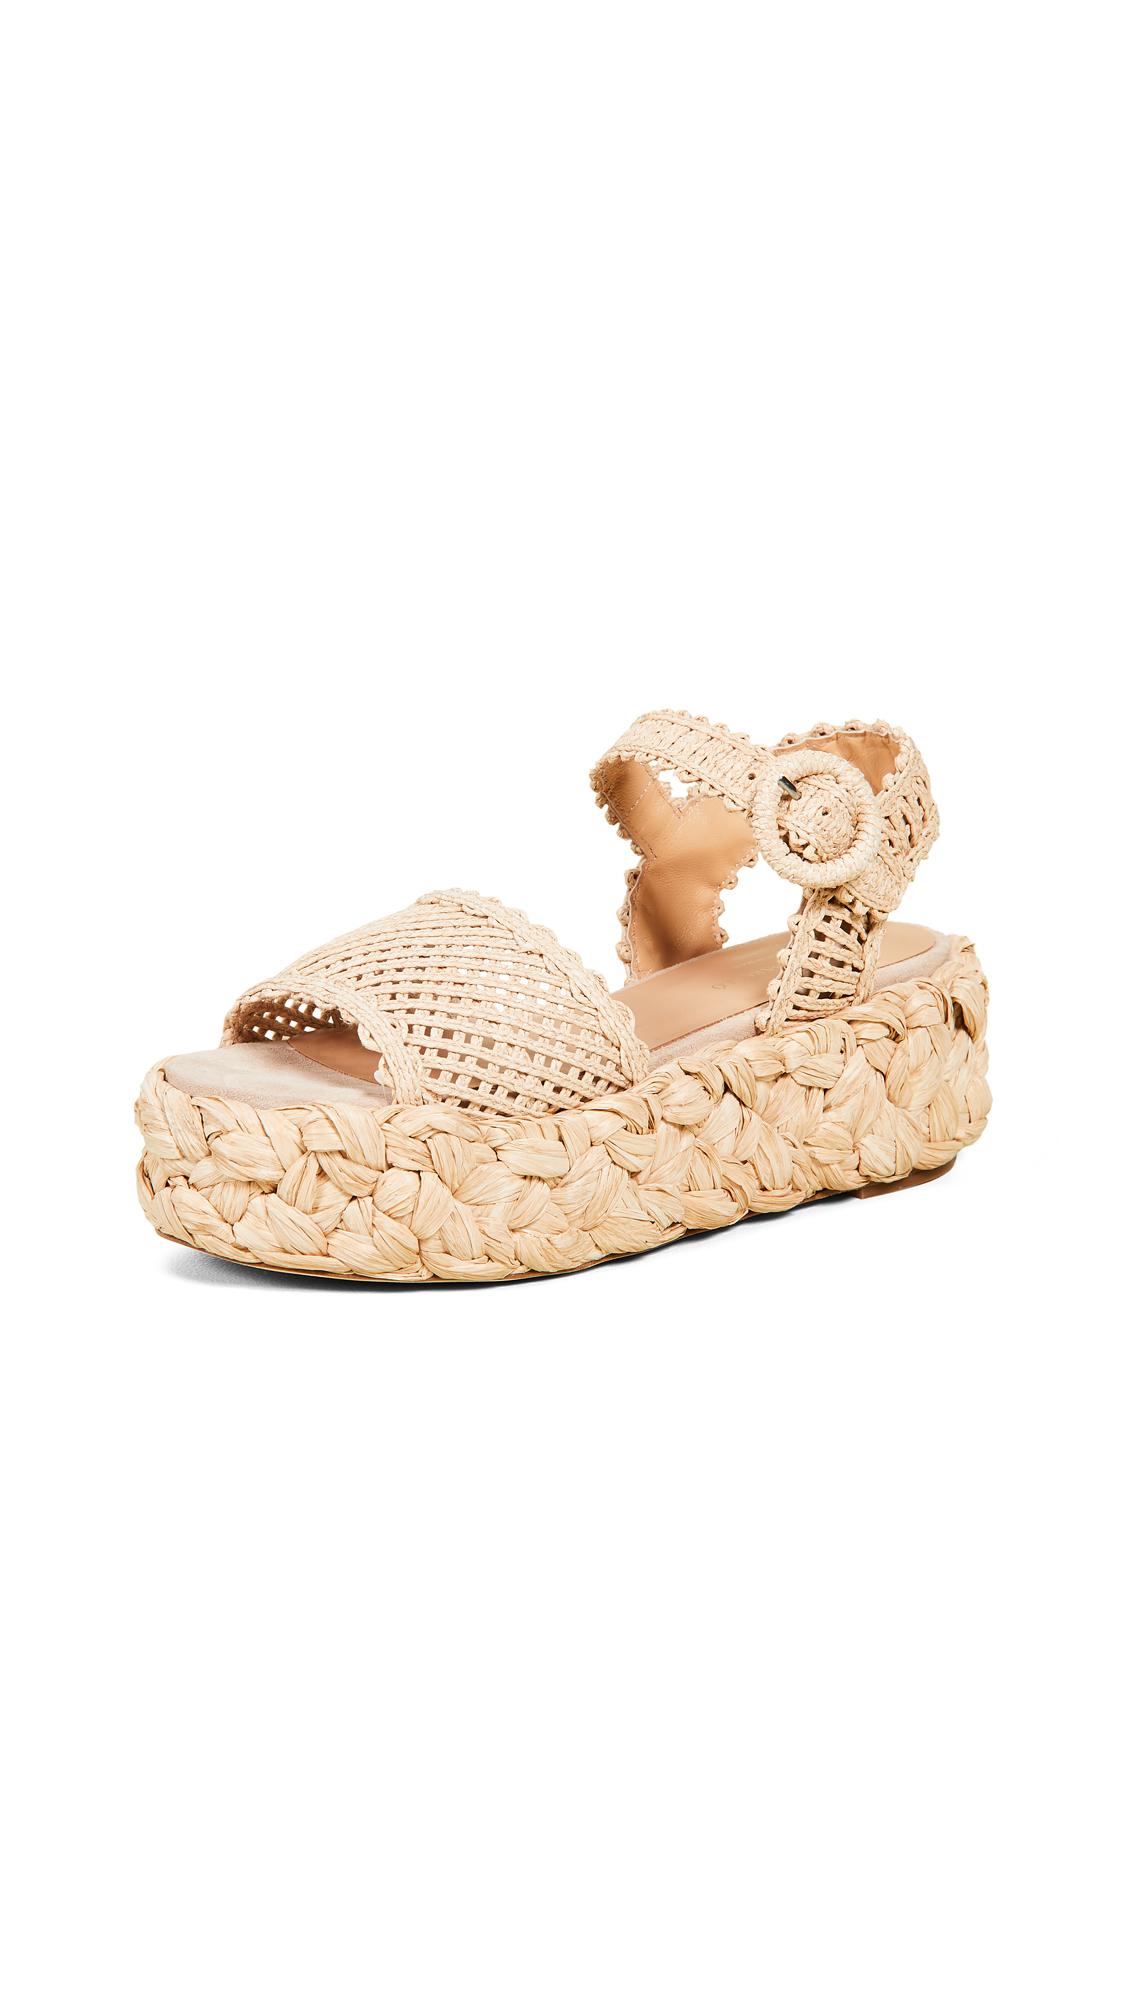 Paloma Barcelo Oda Sandals - Natural